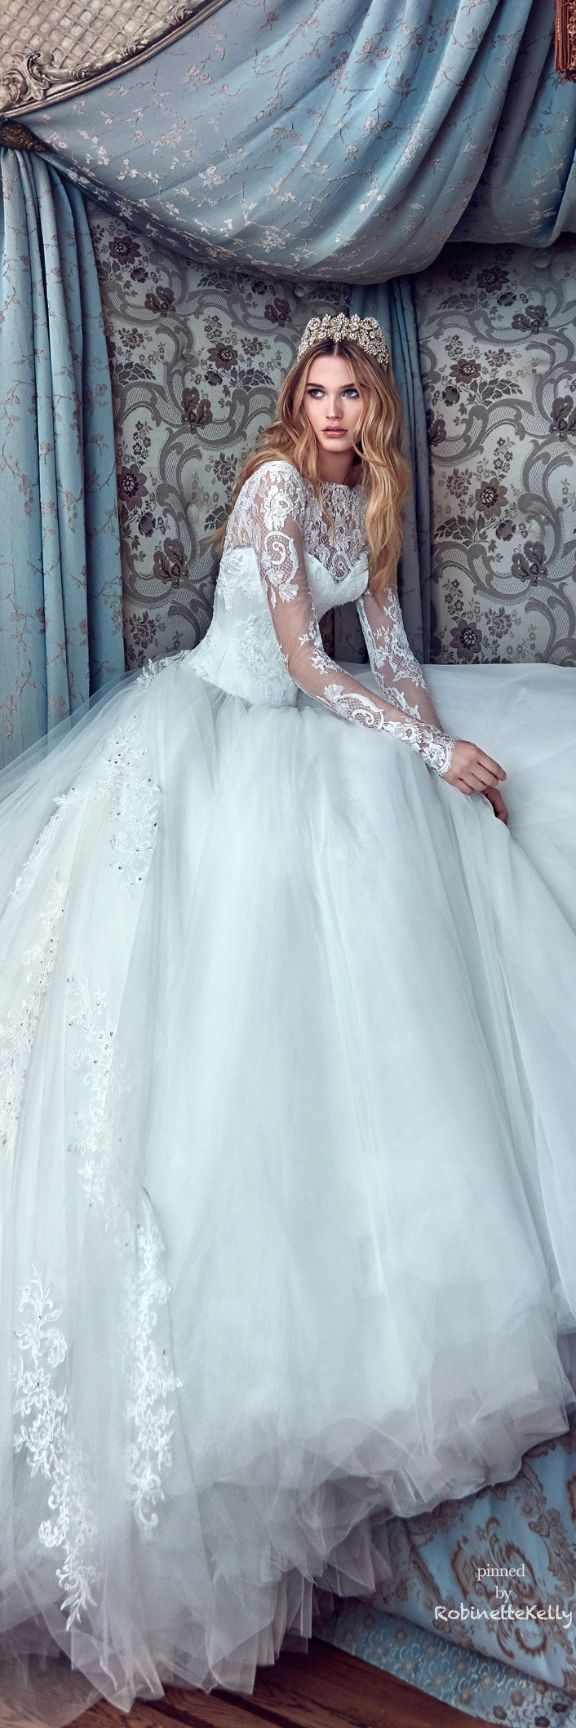 Pin de Yirelys Leon en París o la la   Pinterest   Vestidos de novia ...